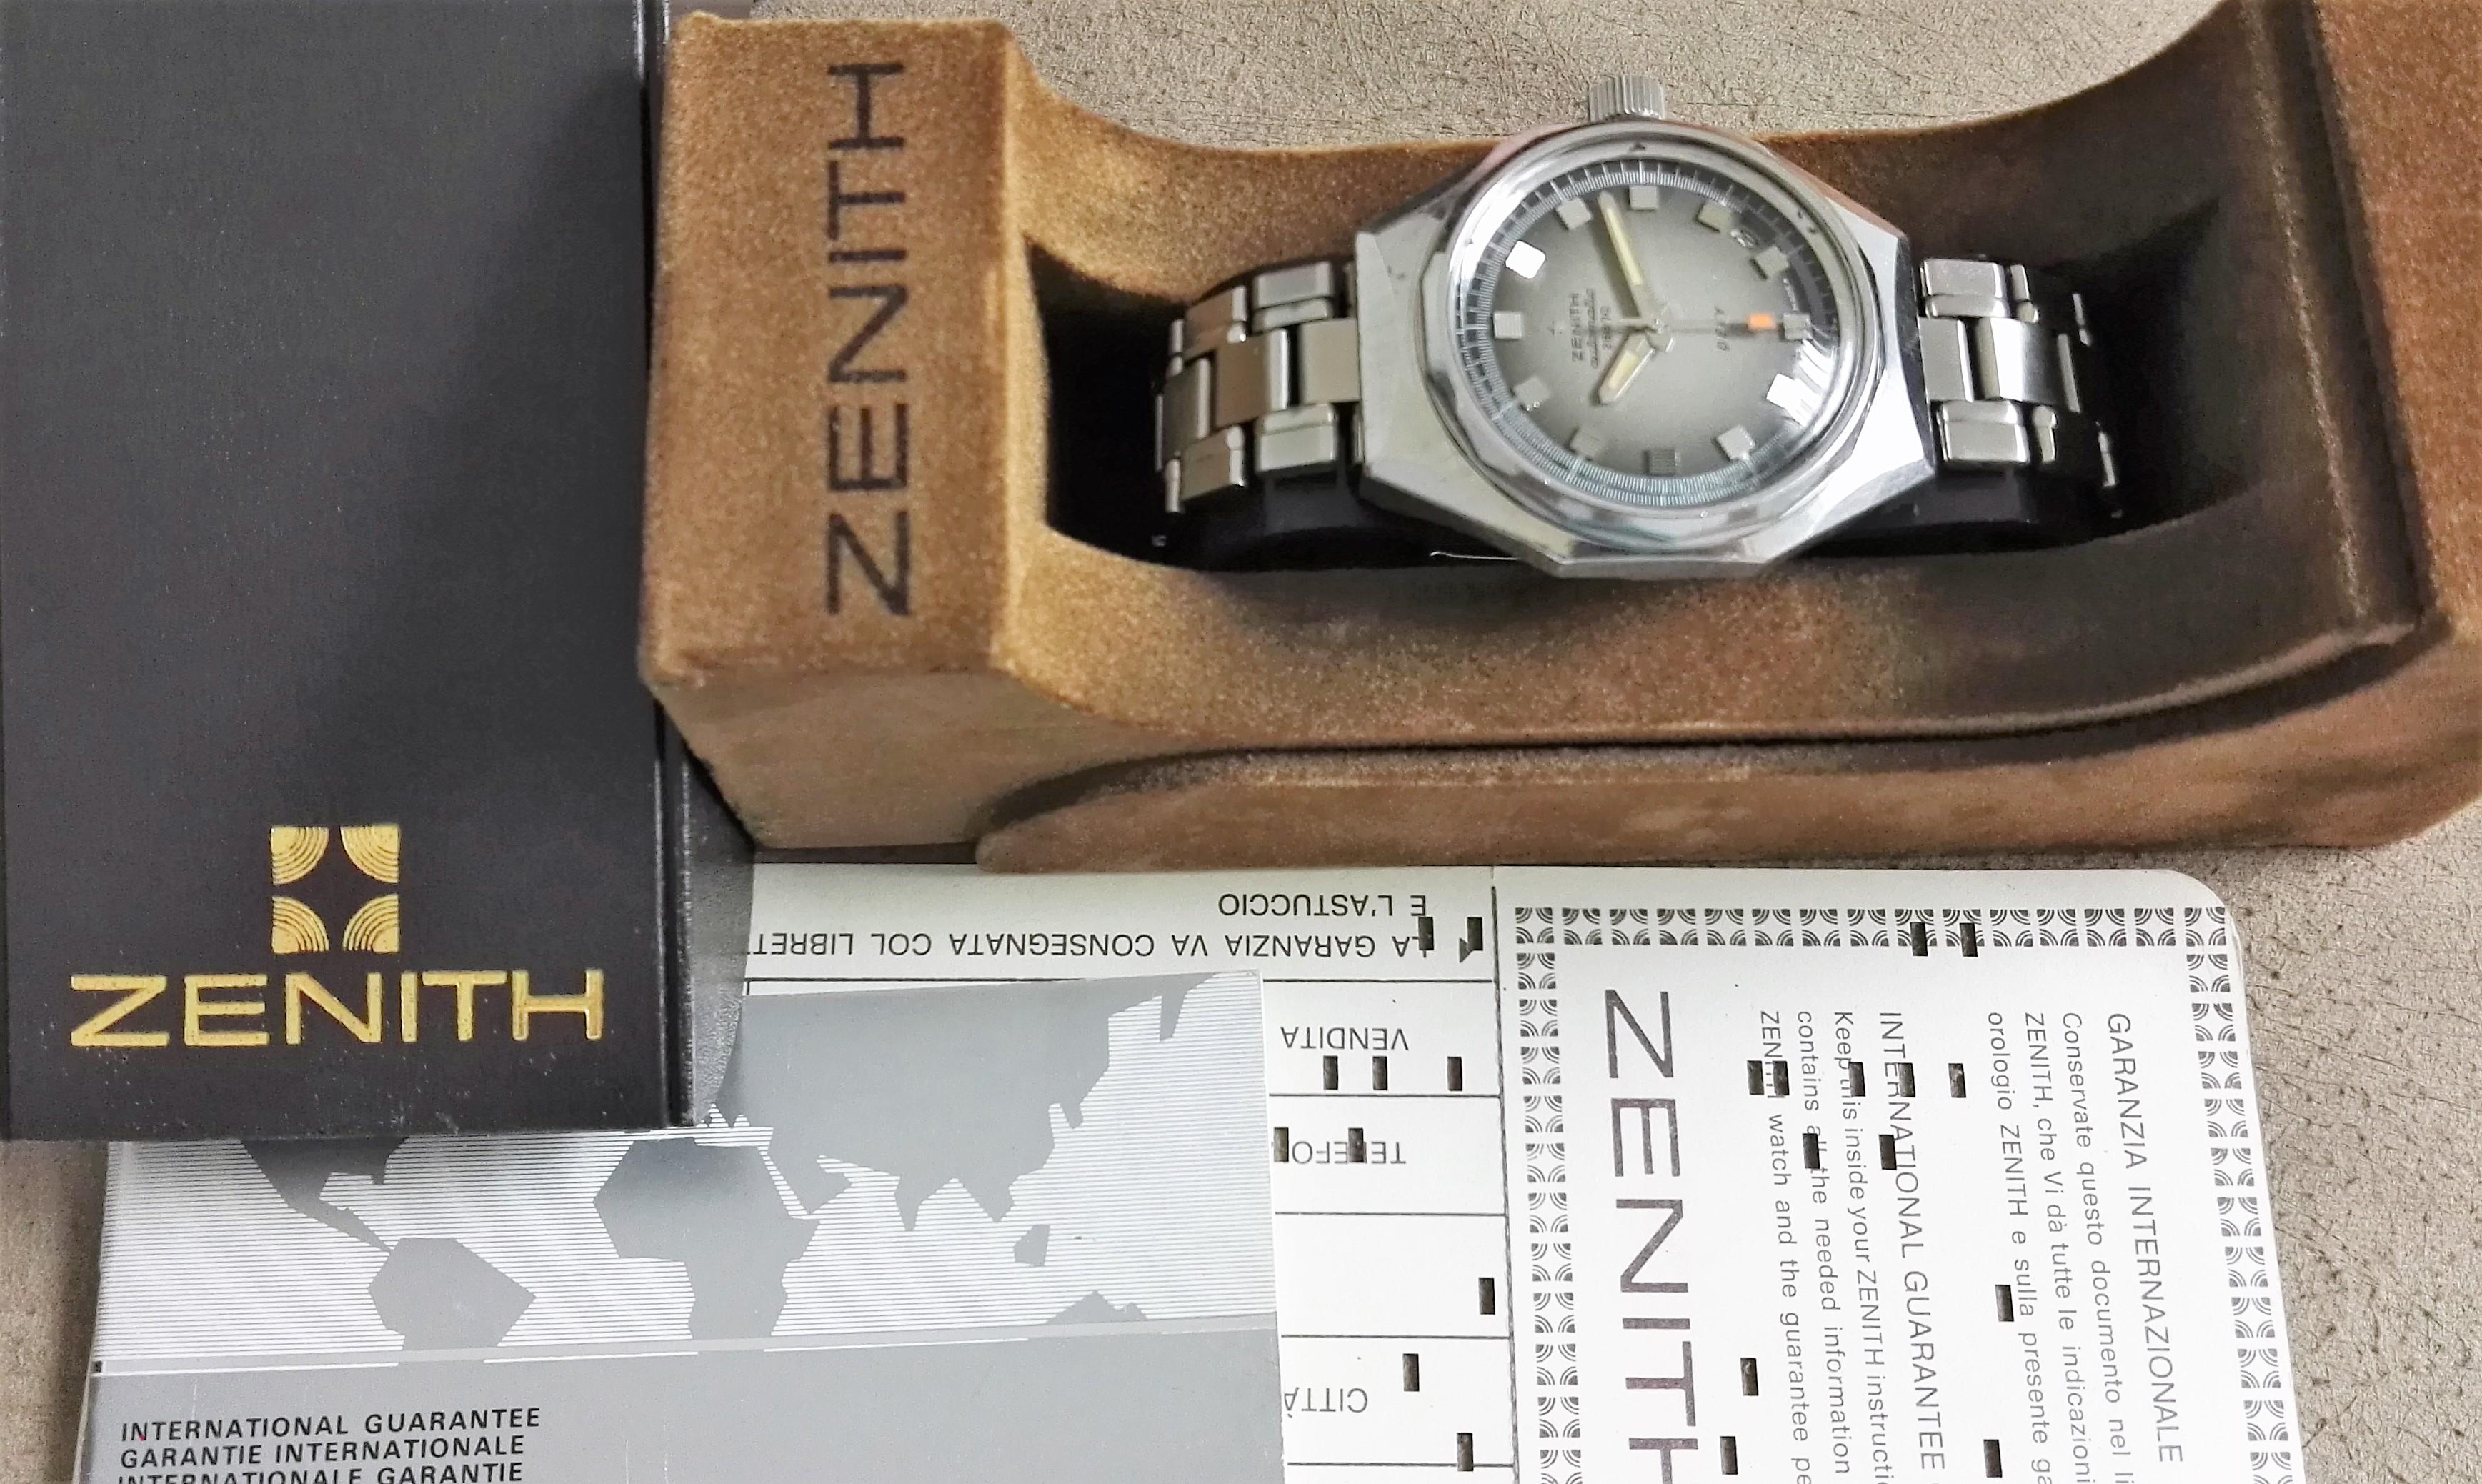 Zenith Defy DEFY AUTOMATIC GREY DIAL DATE GF MAN'S WATCH - FULL SET | San Giorgio a Cremano